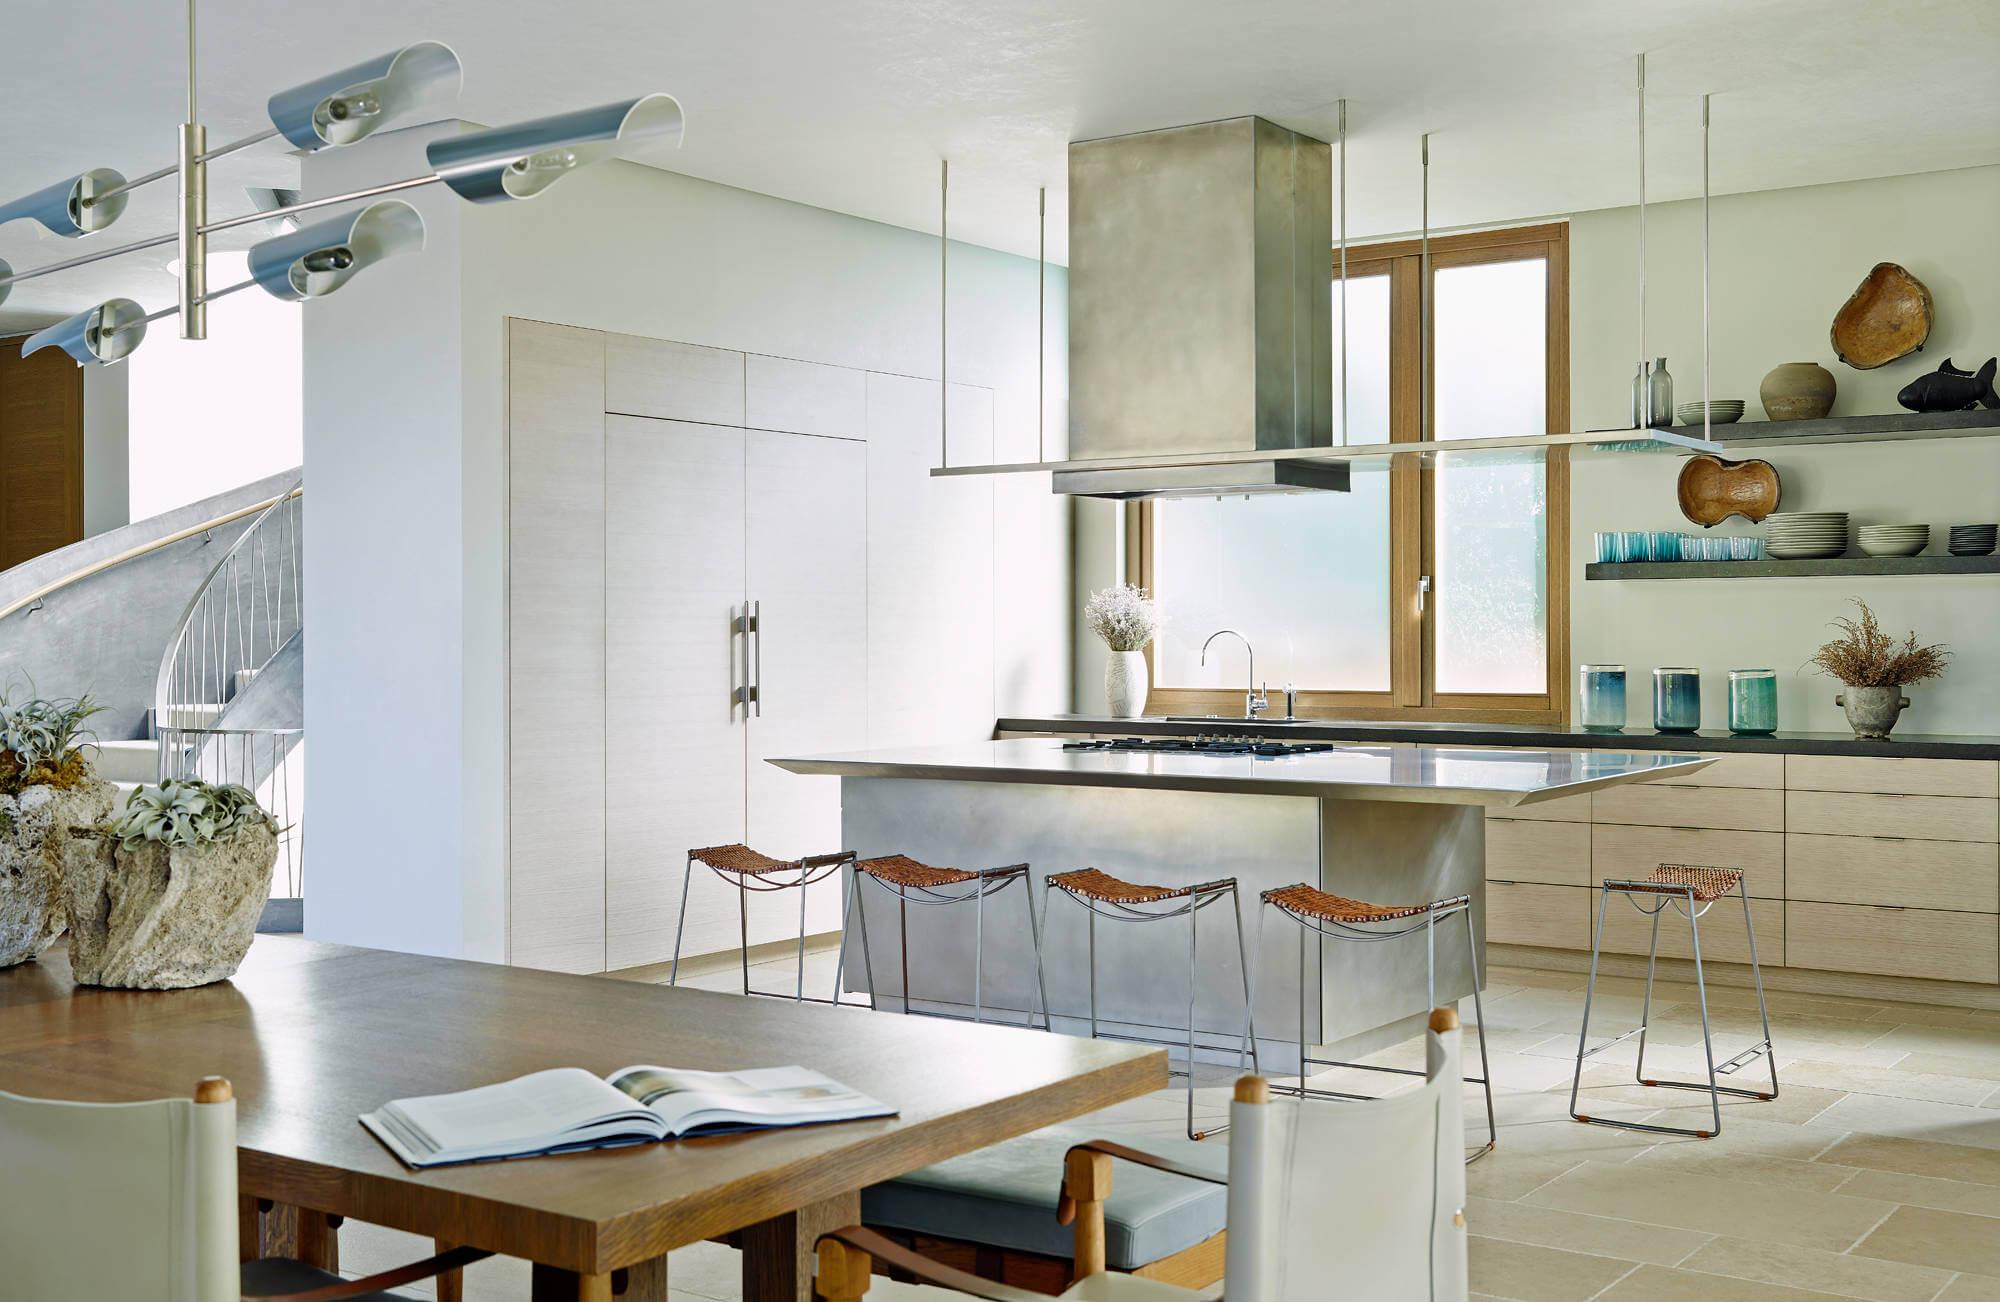 Mediterranean Coronado Residence near San Diego by Island Architects-05